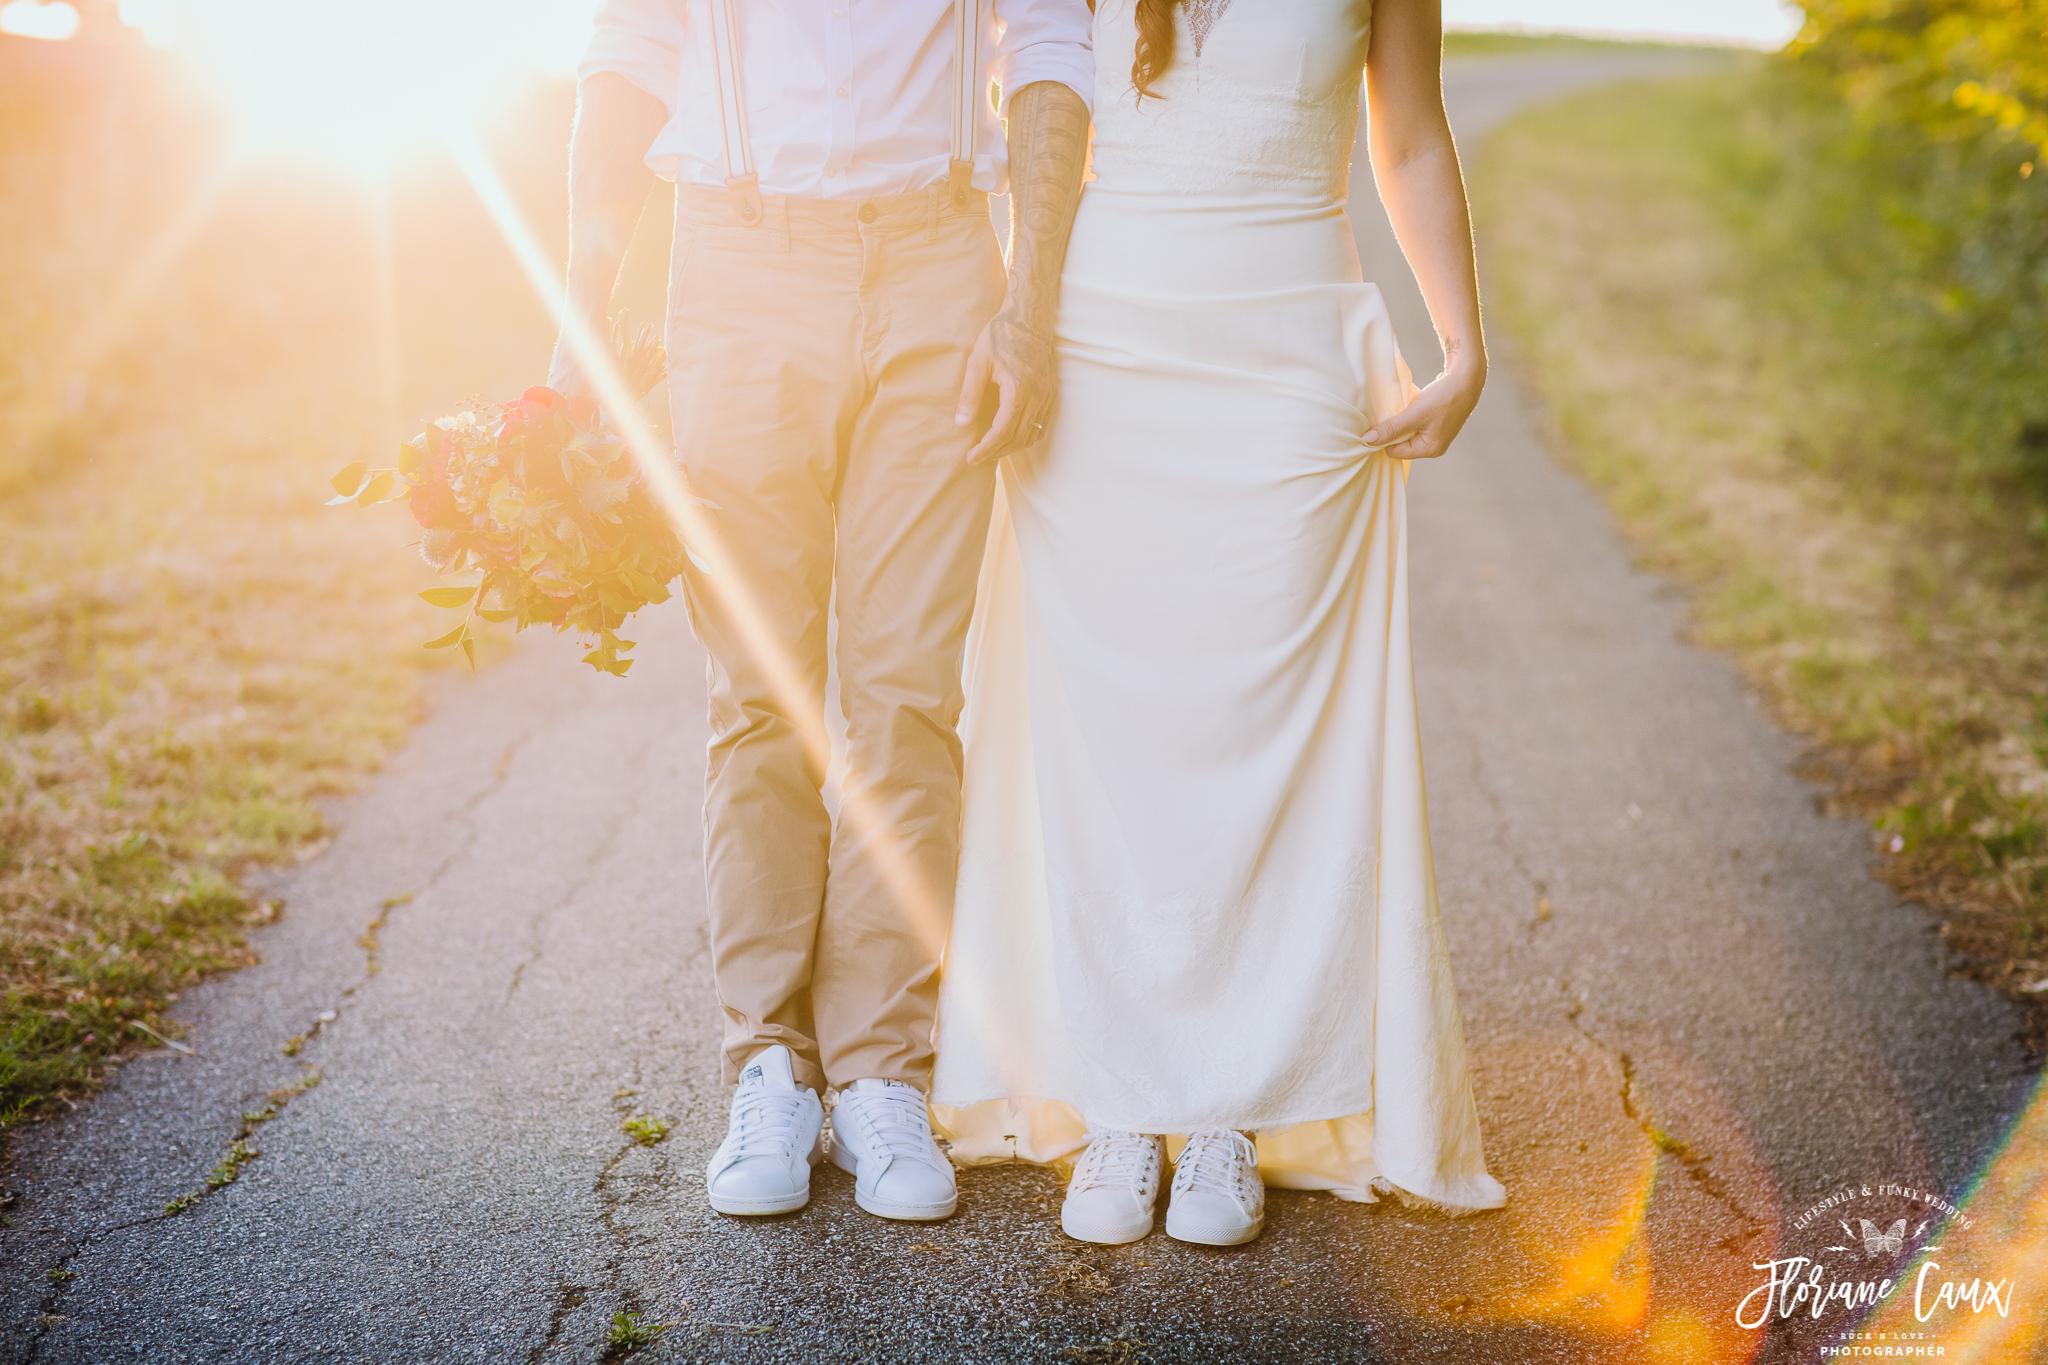 photographe-mariage-toulouse-rocknroll-maries-tatoues-floriane-caux-81